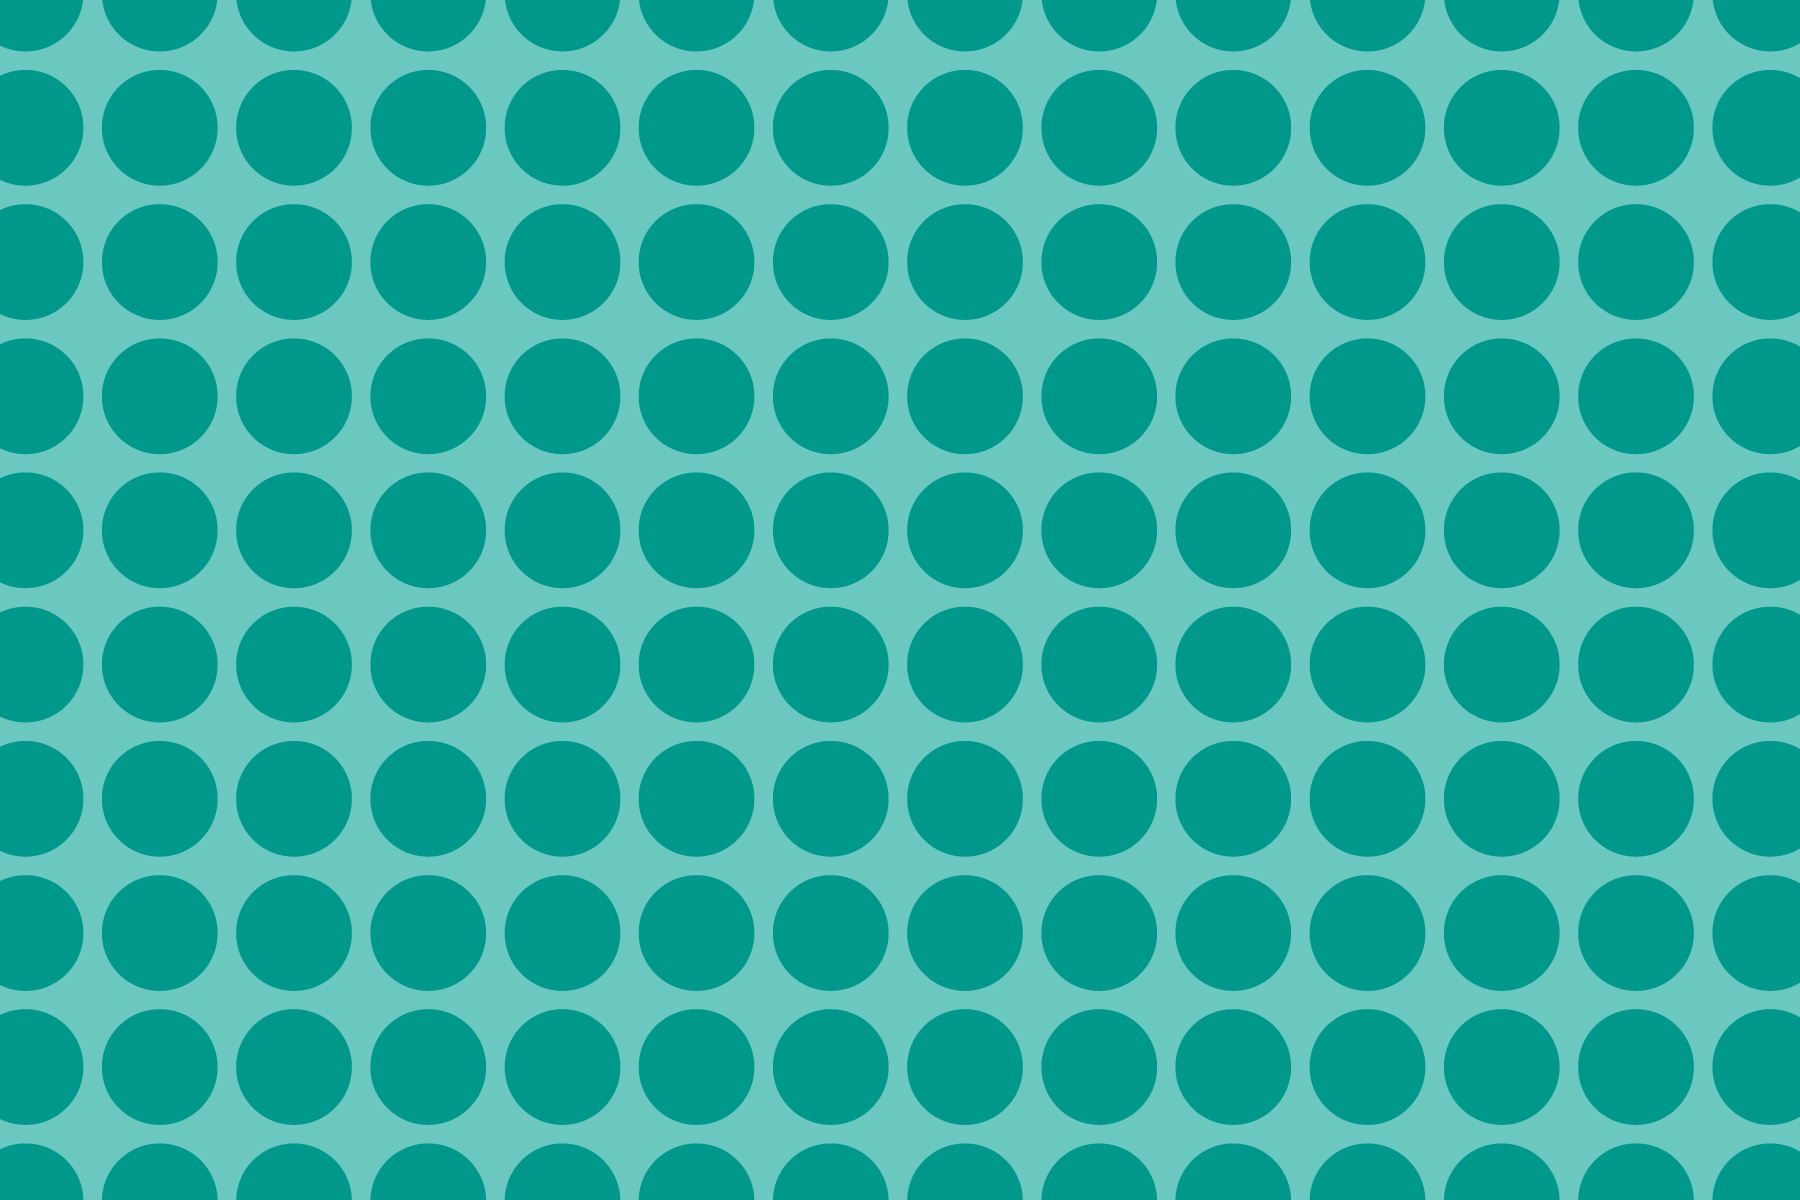 Large Polka Dot-01.jpg